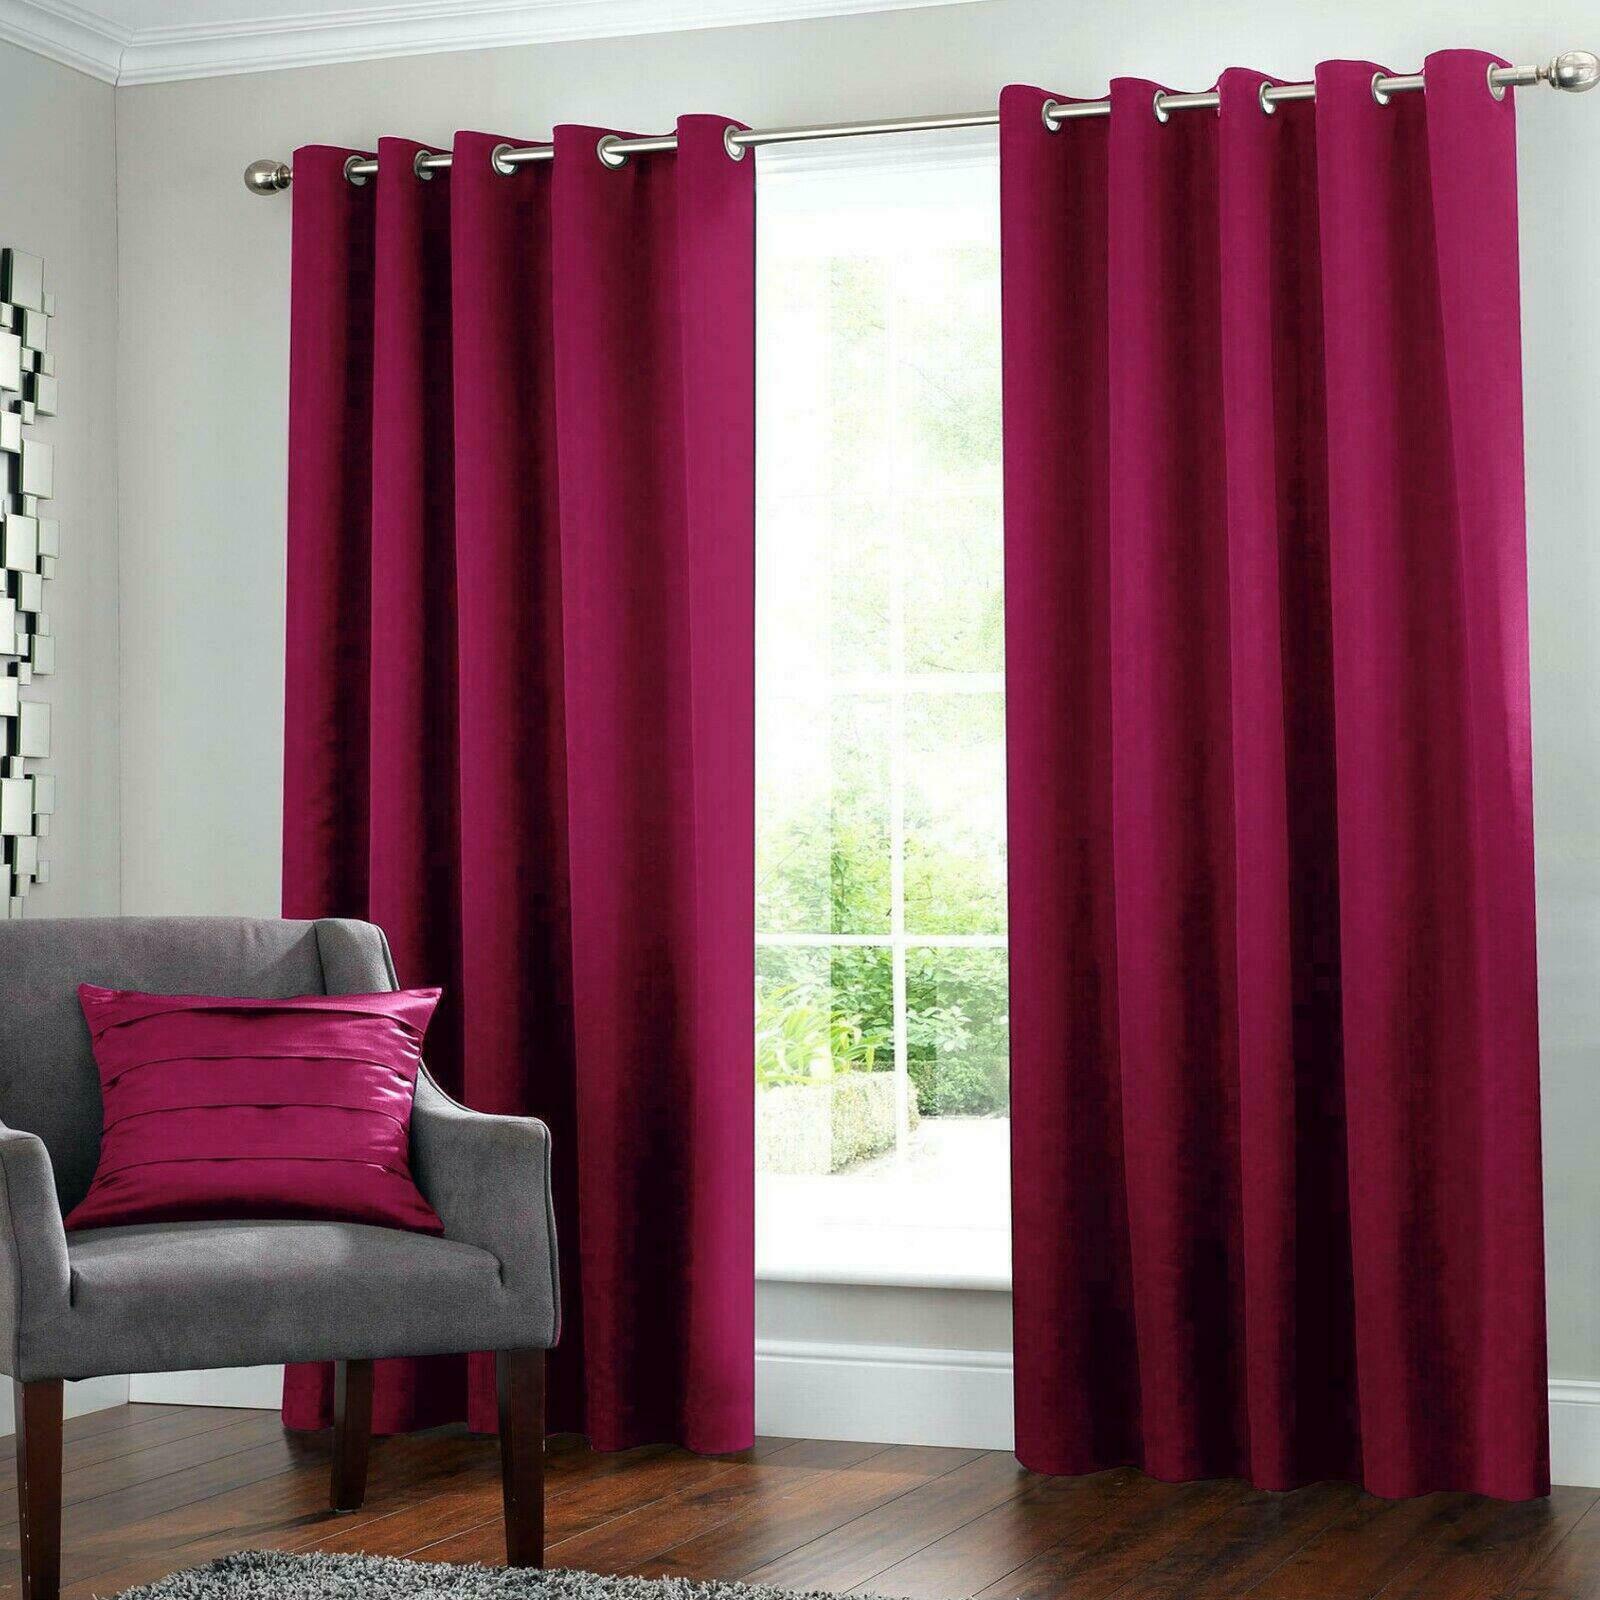 2 Blockout Curtains Eyelet Window Curtain Blackout Draperies Living Room Bedroom 250x230cm Burgundy Kogan Com